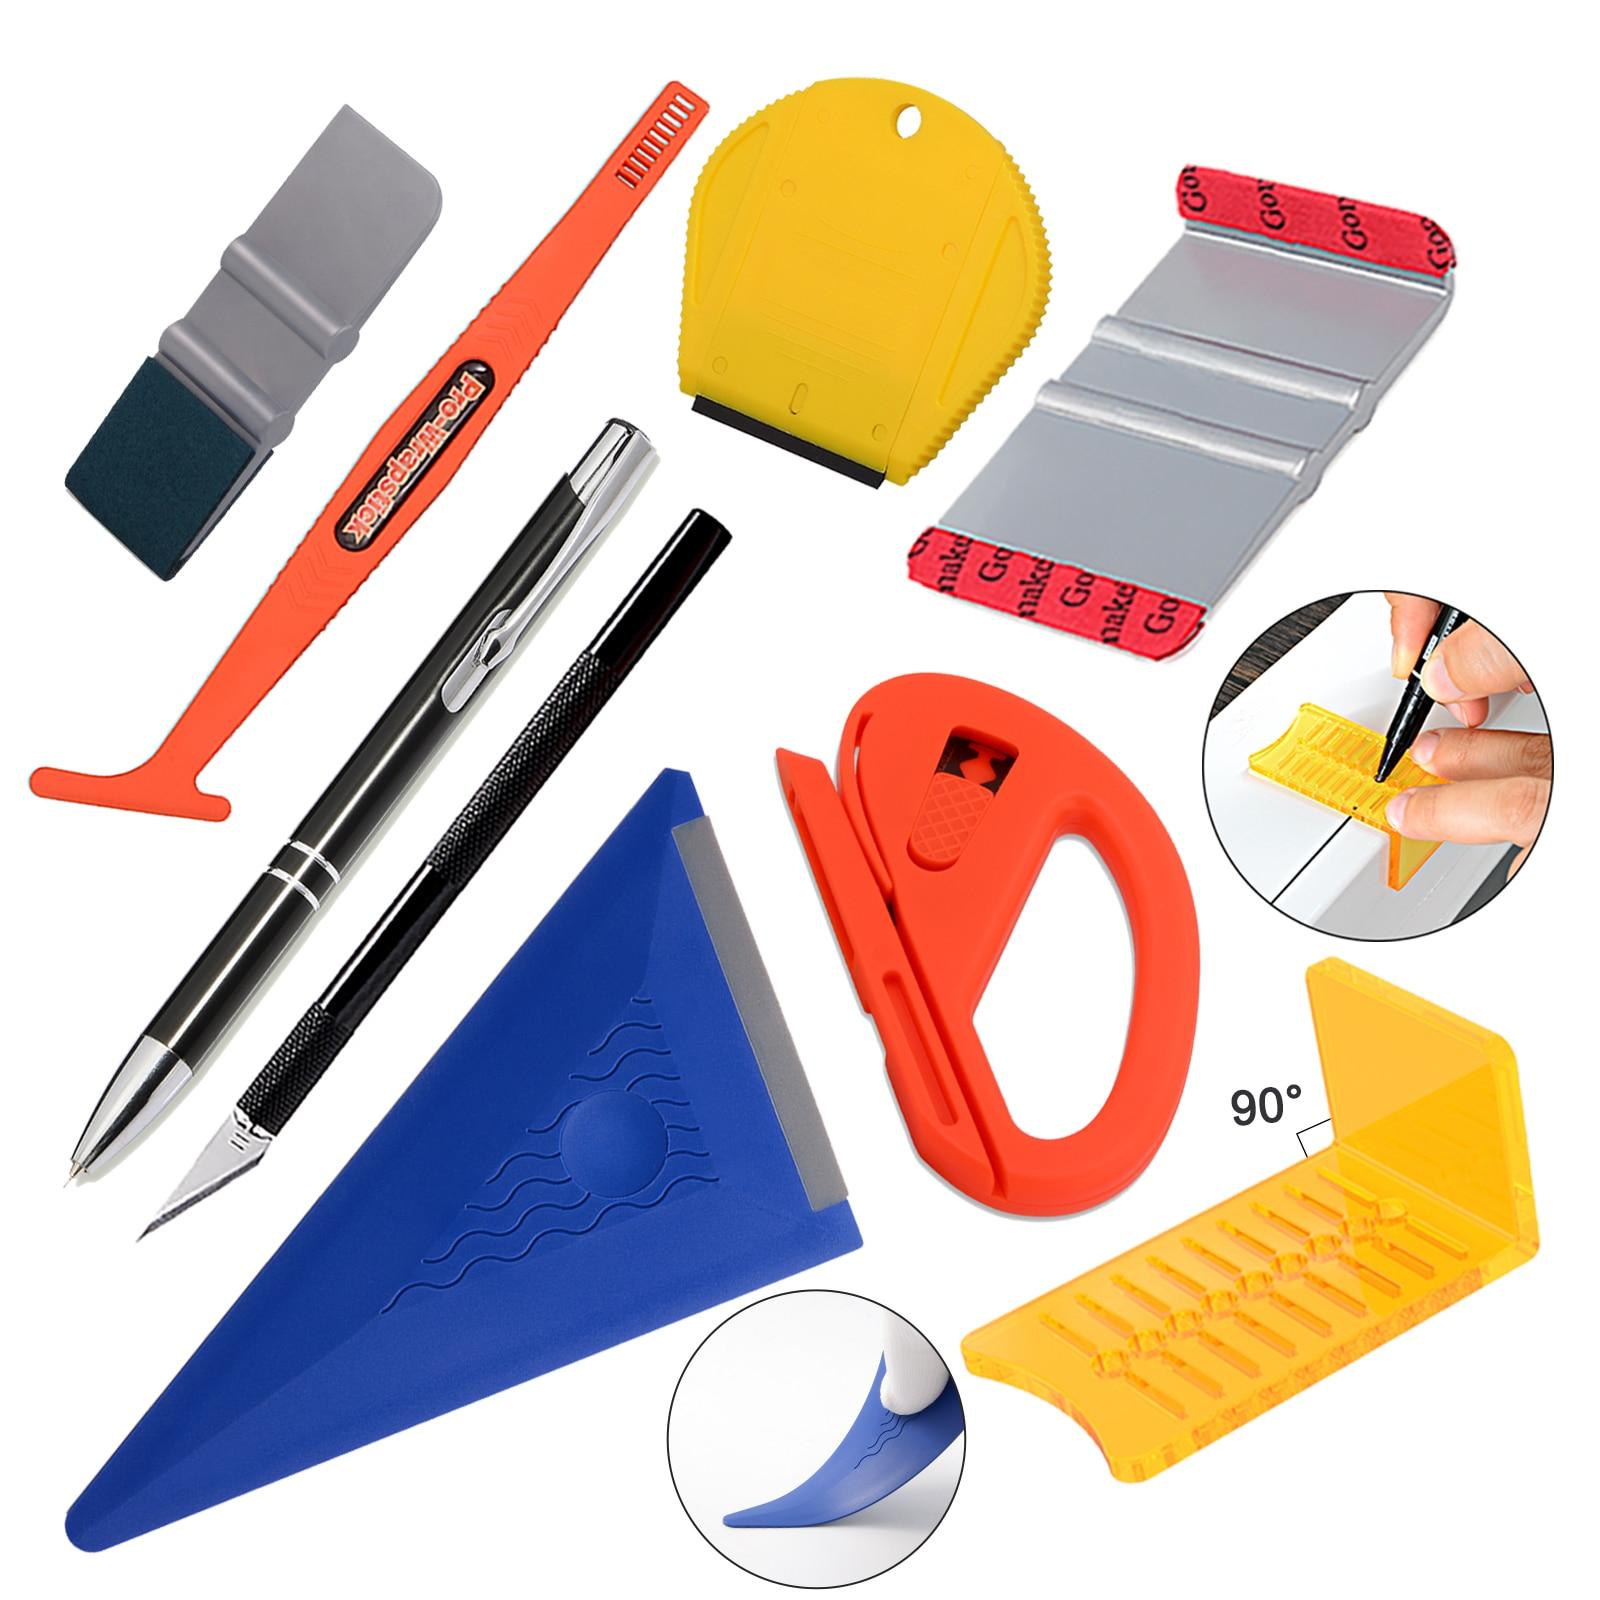 EHDIS Carbon Film Vinyl Wrap Cut Tool Window Tinting Car Decal Paint Razor Scraper Glass Sticker Squeegee Motorcycle Accessories